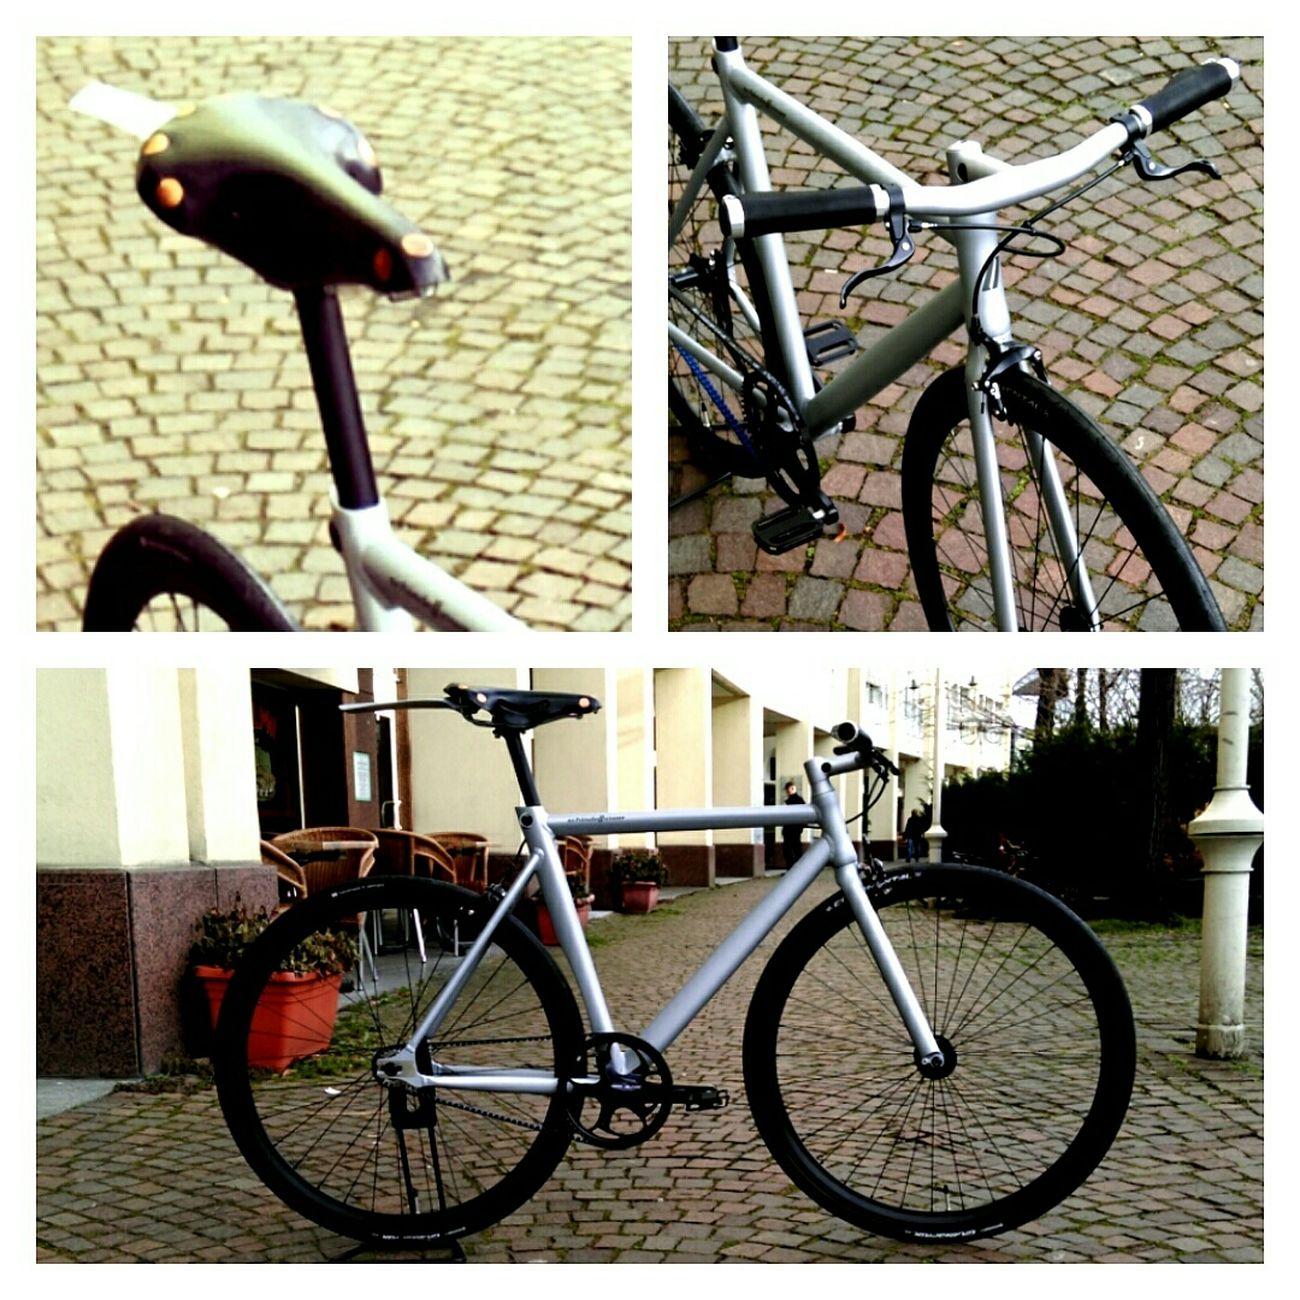 Schindelhauer Bike Viktor SingleSpeed Bike Stylish BundesRadBonn Bikeshop Fahrradladen Fahrrad Beltdrive Fixie/fixed Gear